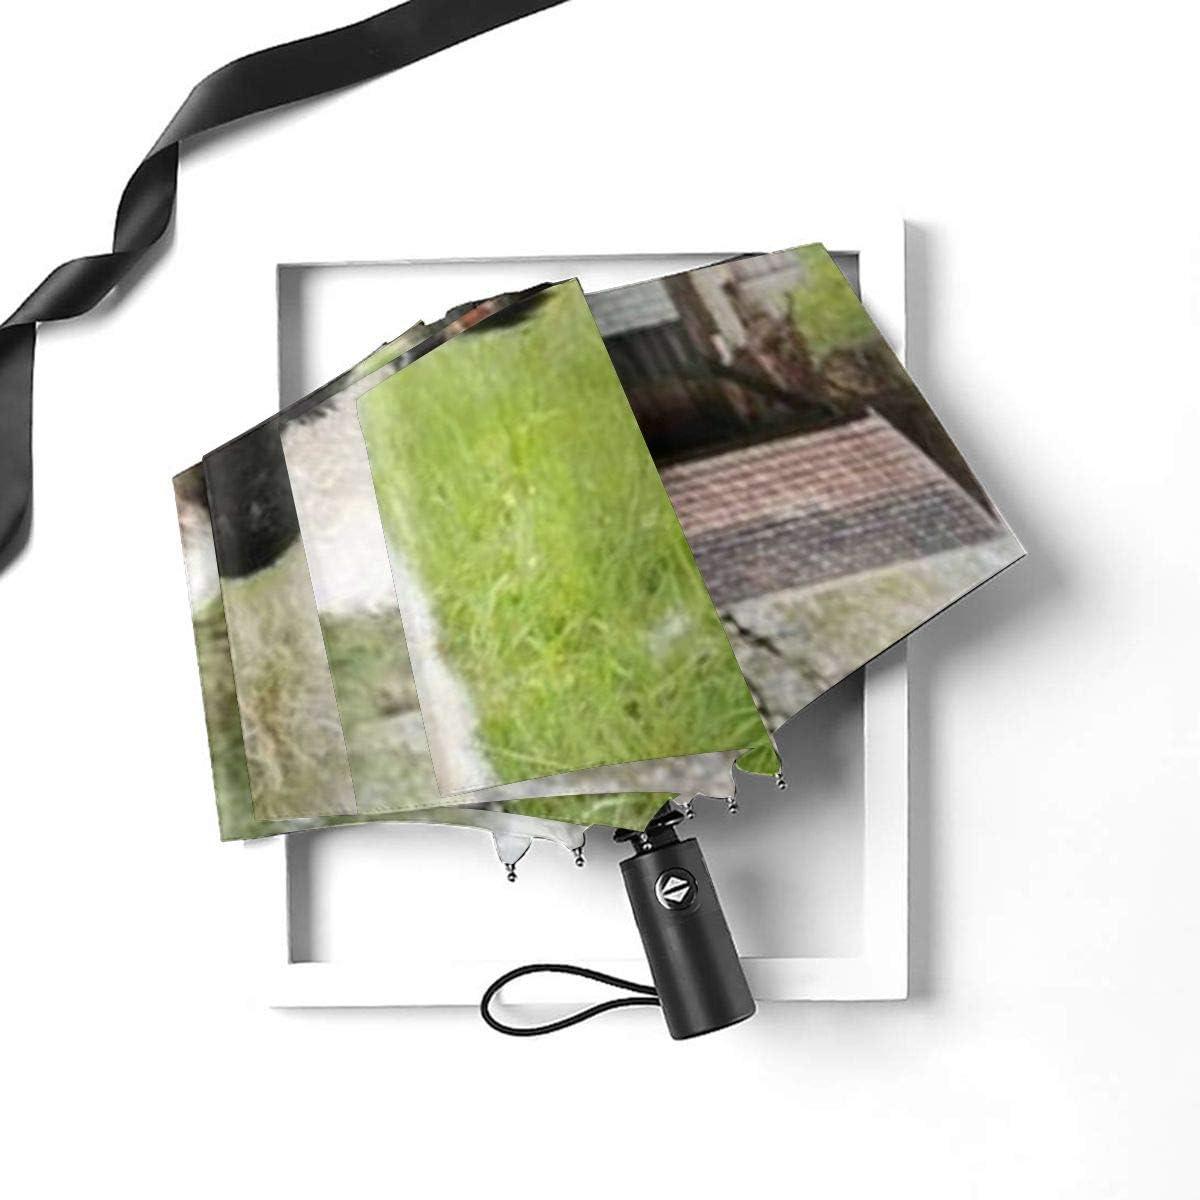 Scotland Black Sheep Automatic Open Folding Compact Travel Umbrellas For Women